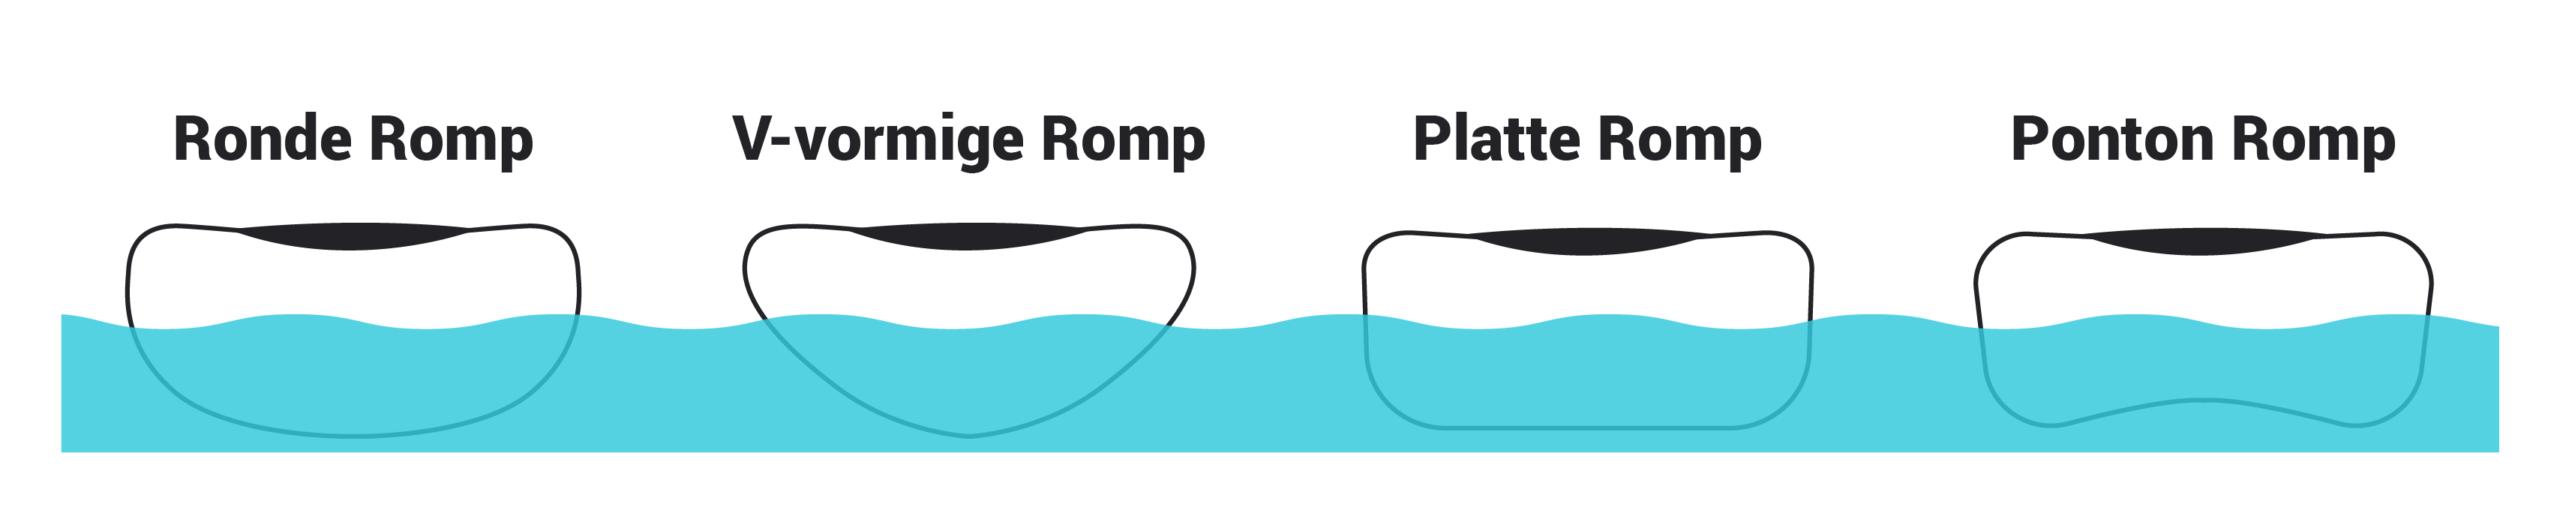 Kajak Rompvormen